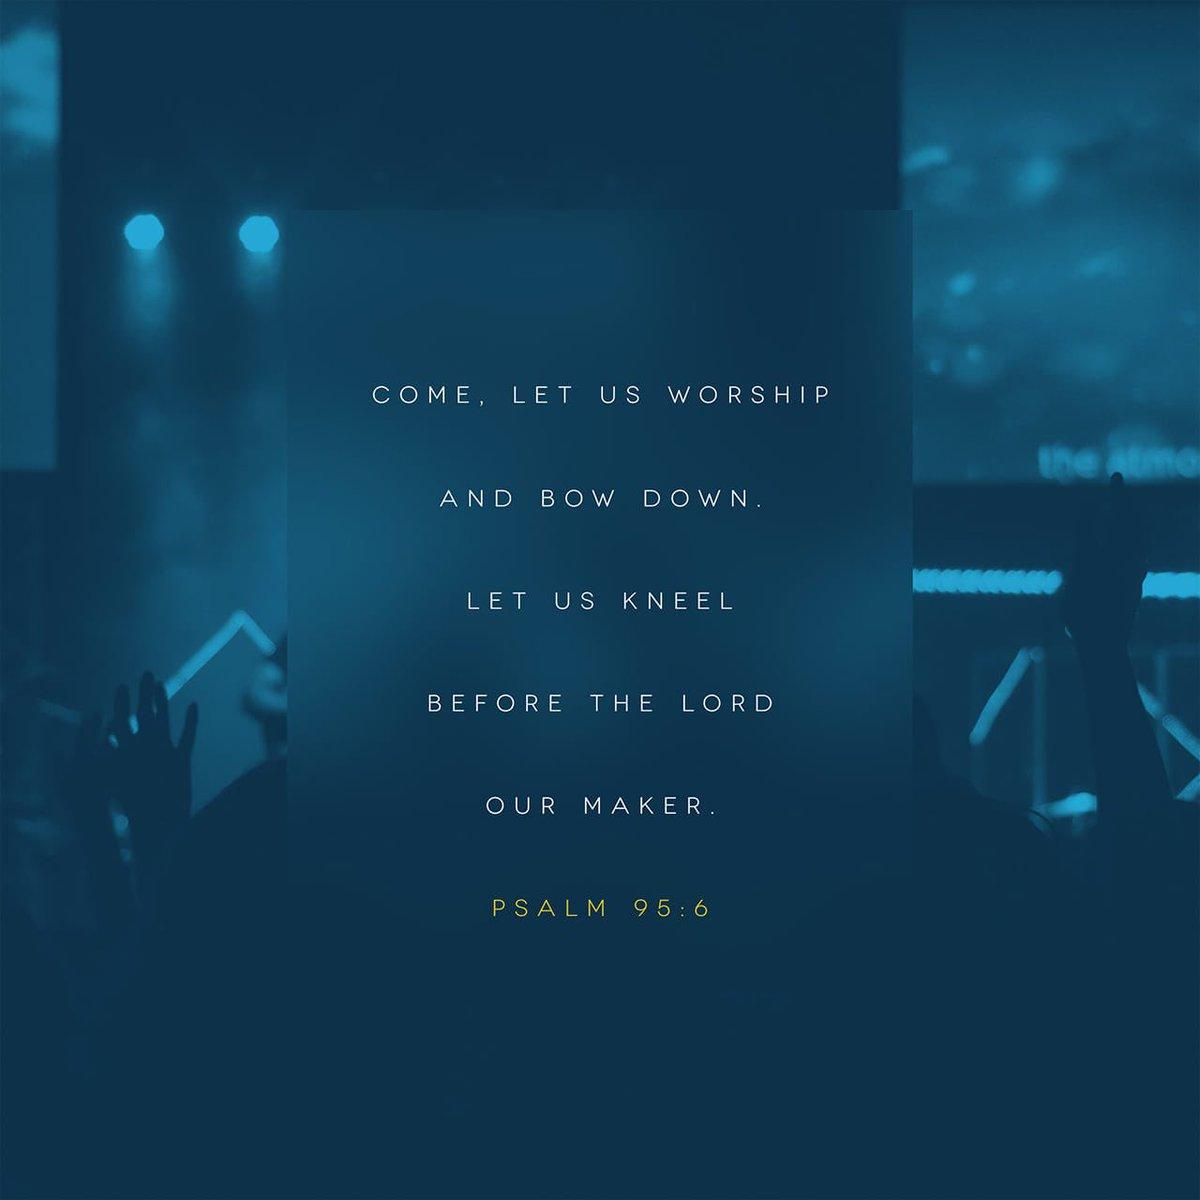 Good Morning 😃🧎🏽♀️🙌🏽🙏🏽 #SundayMotivation #SundayWisdom #PraiseHim #worship #BibleStudy #bibleverse #VerseOfTheDay #morningdevotion #dailydevotions